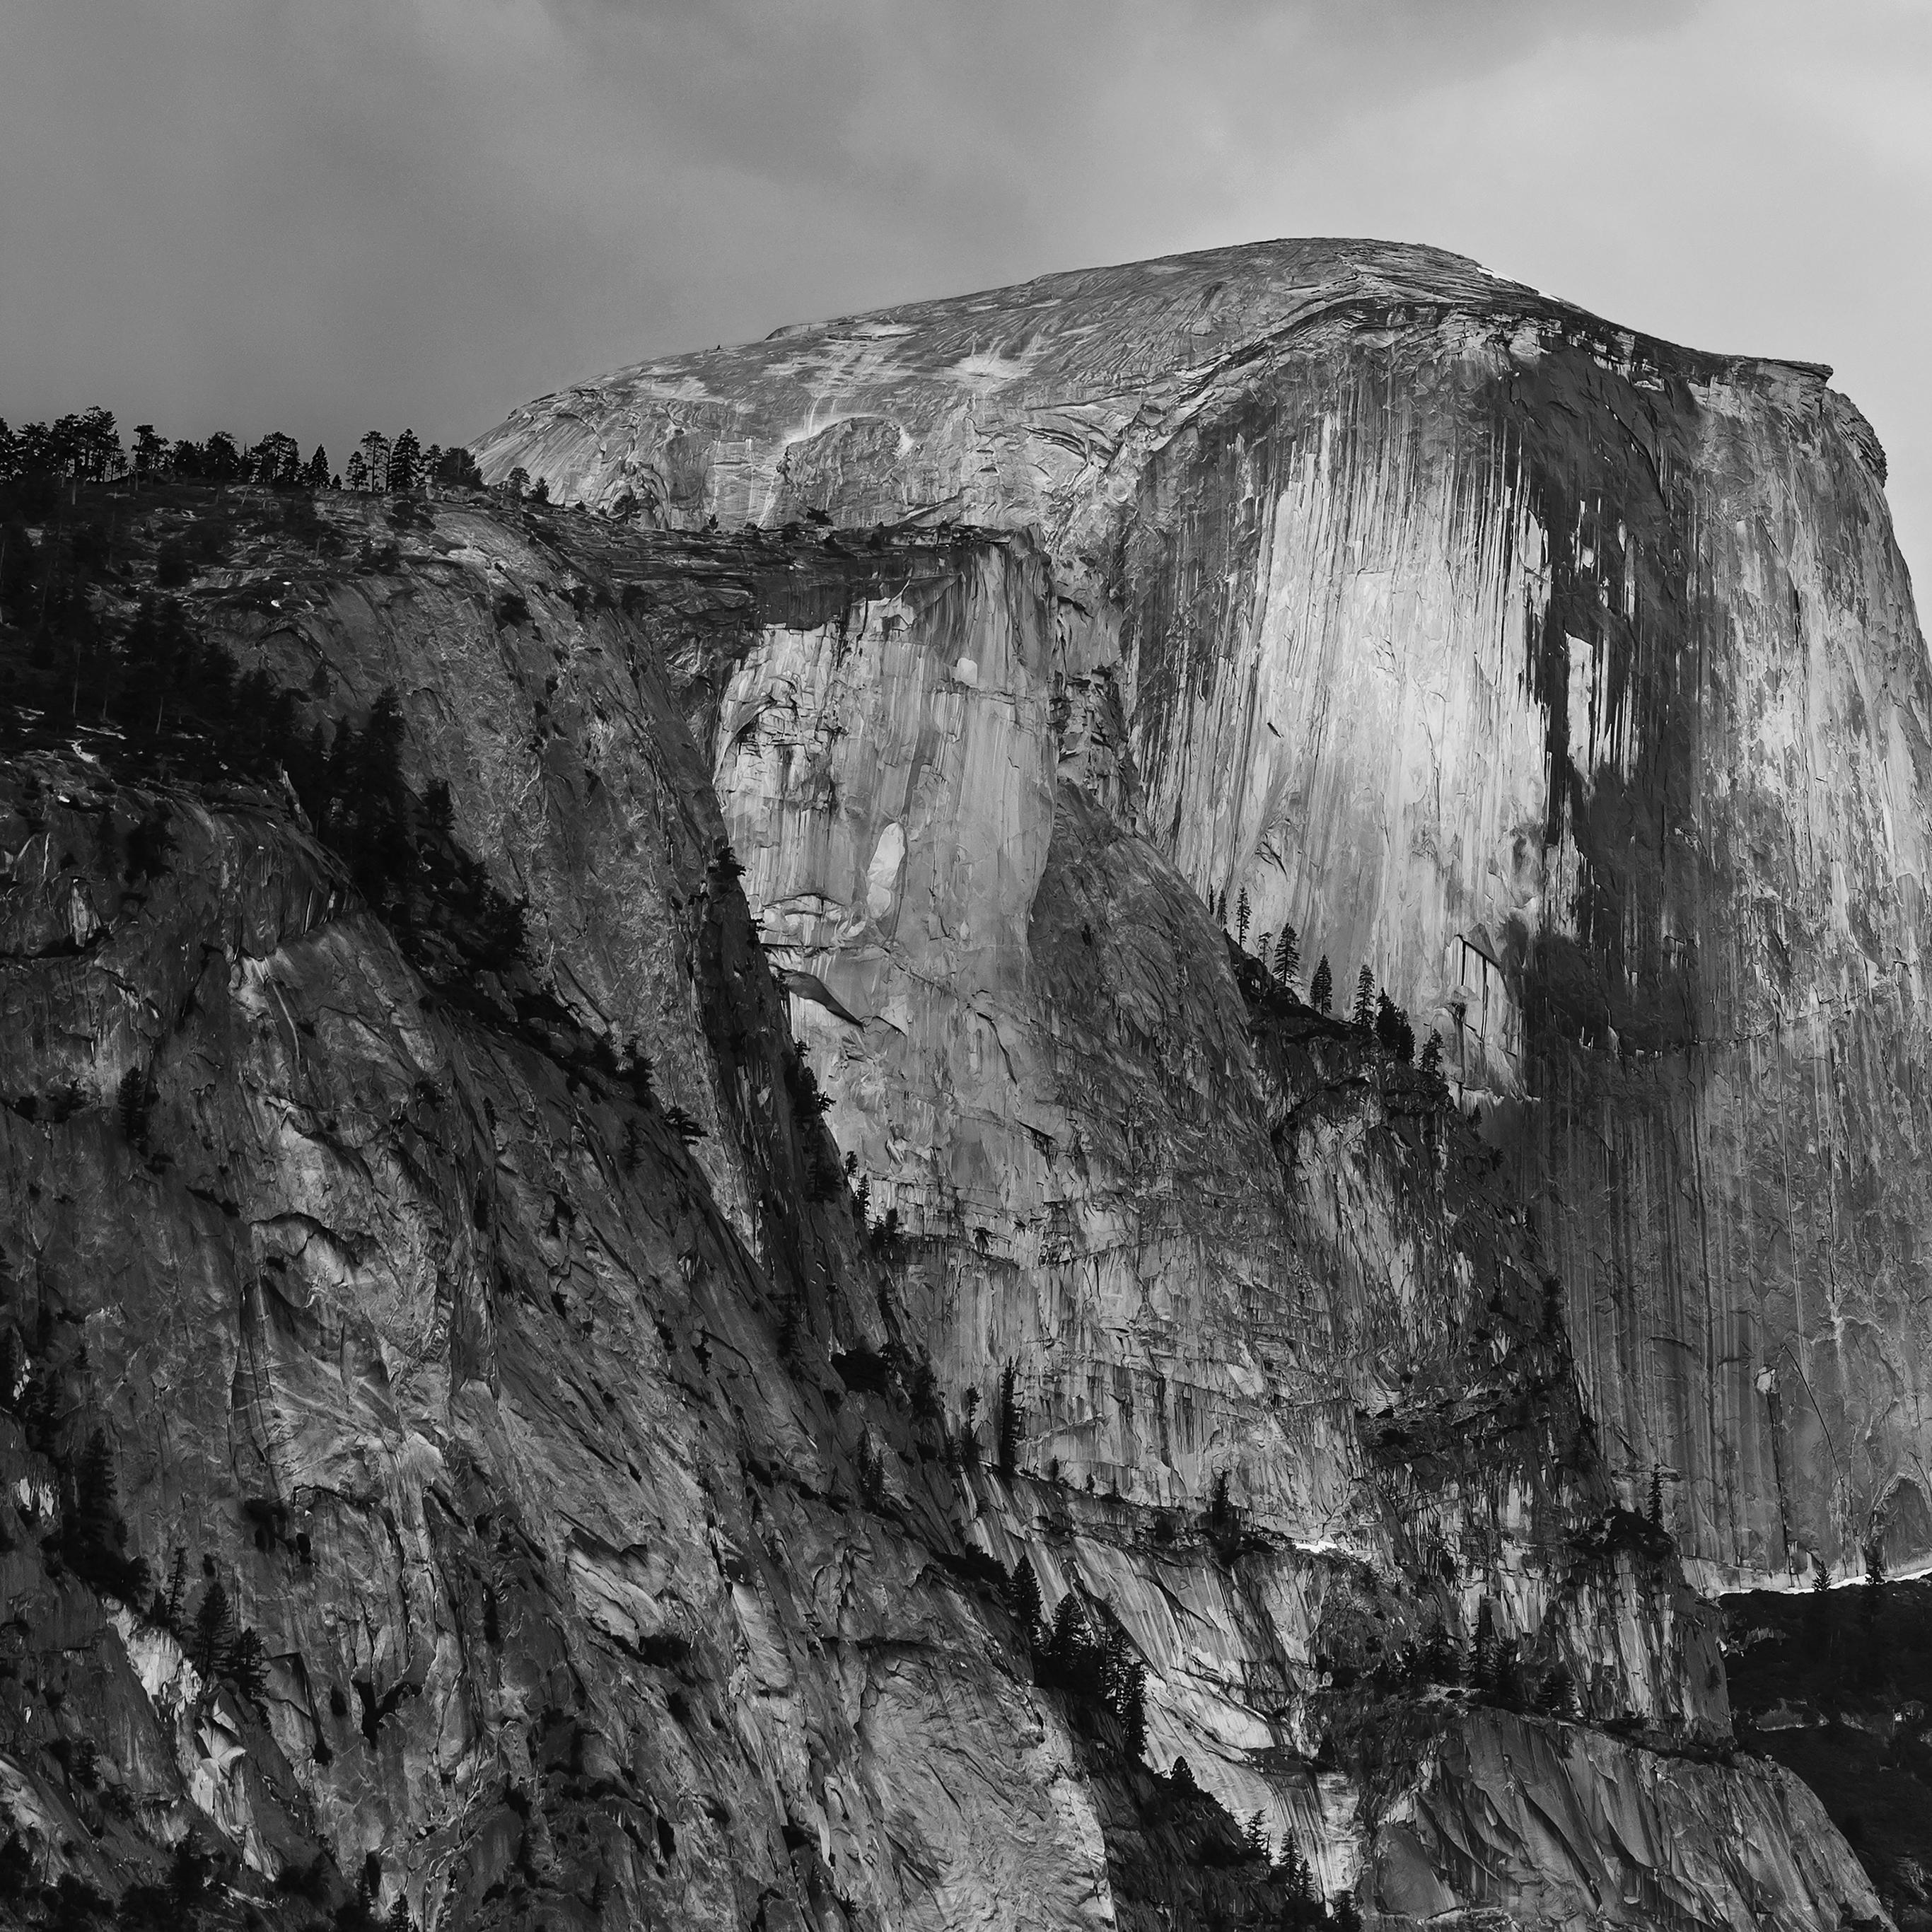 Osx Yosemite: IPad Retina